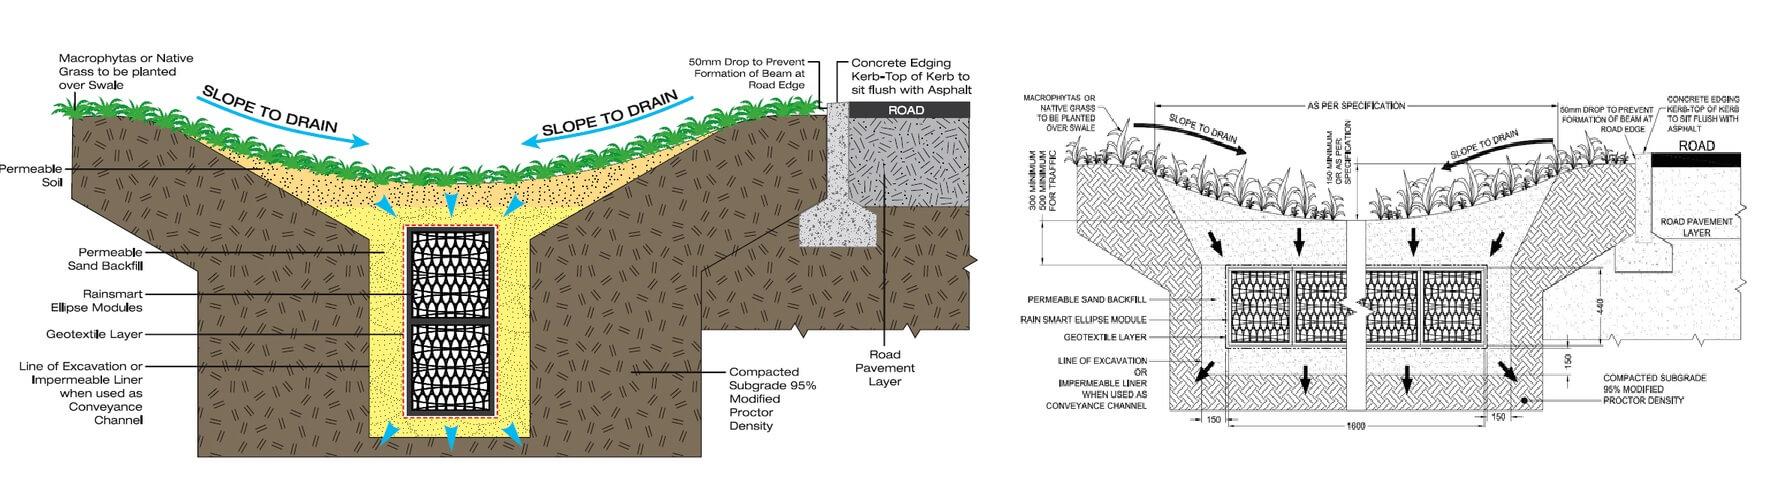 Grass Swales Diagram For Soakaways